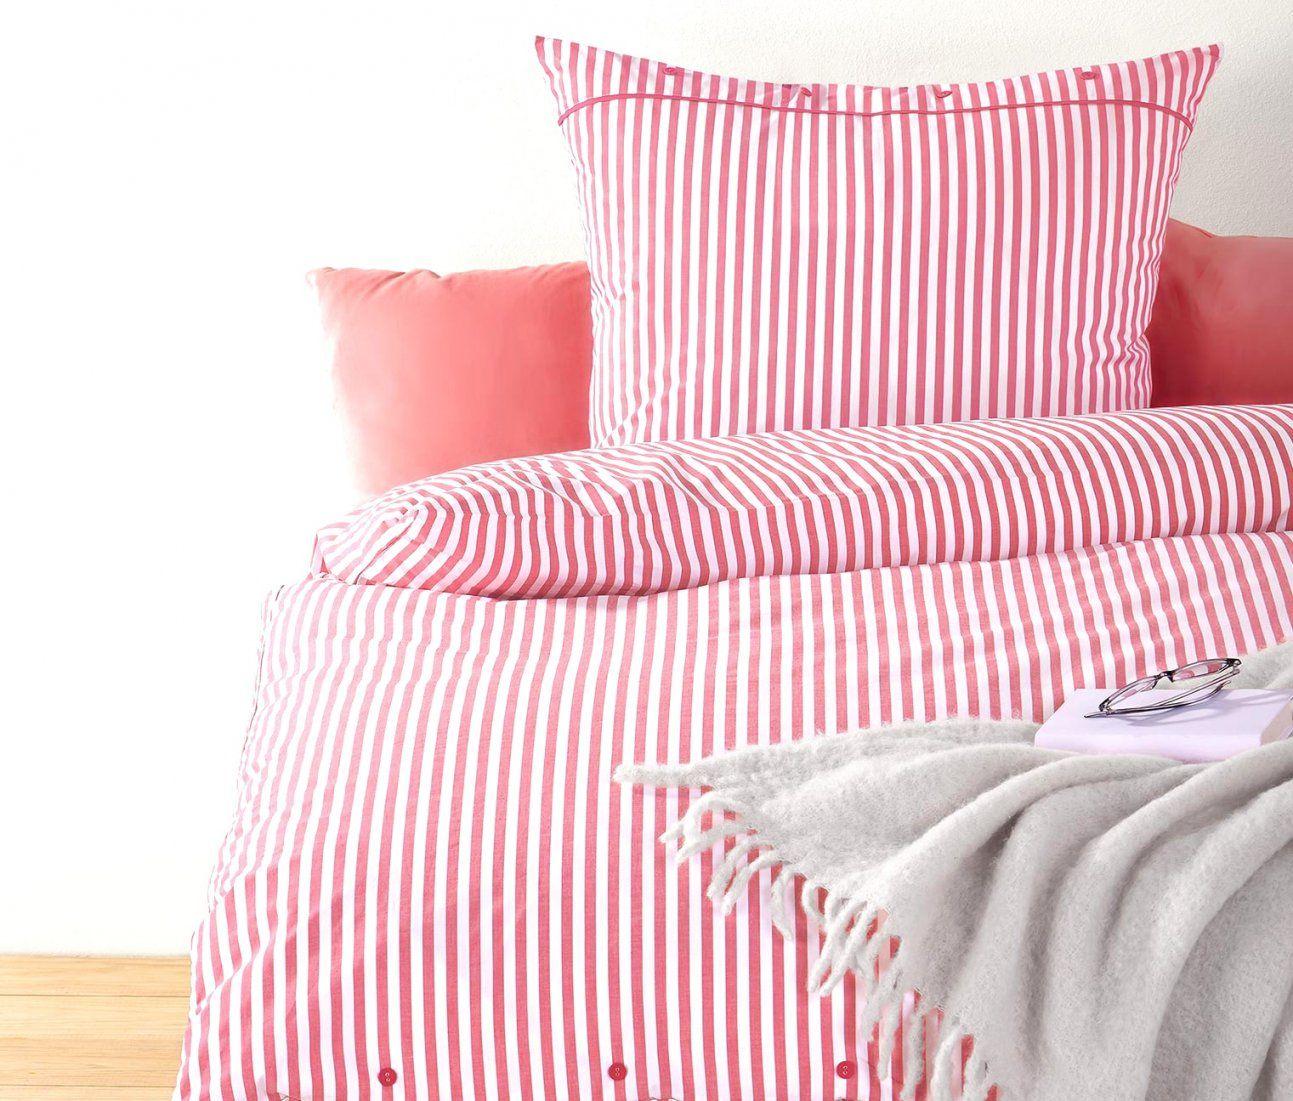 fantastische ideen perkal bettw sche tchibo und sthetische von tchibo bettw sche perkal bild. Black Bedroom Furniture Sets. Home Design Ideas